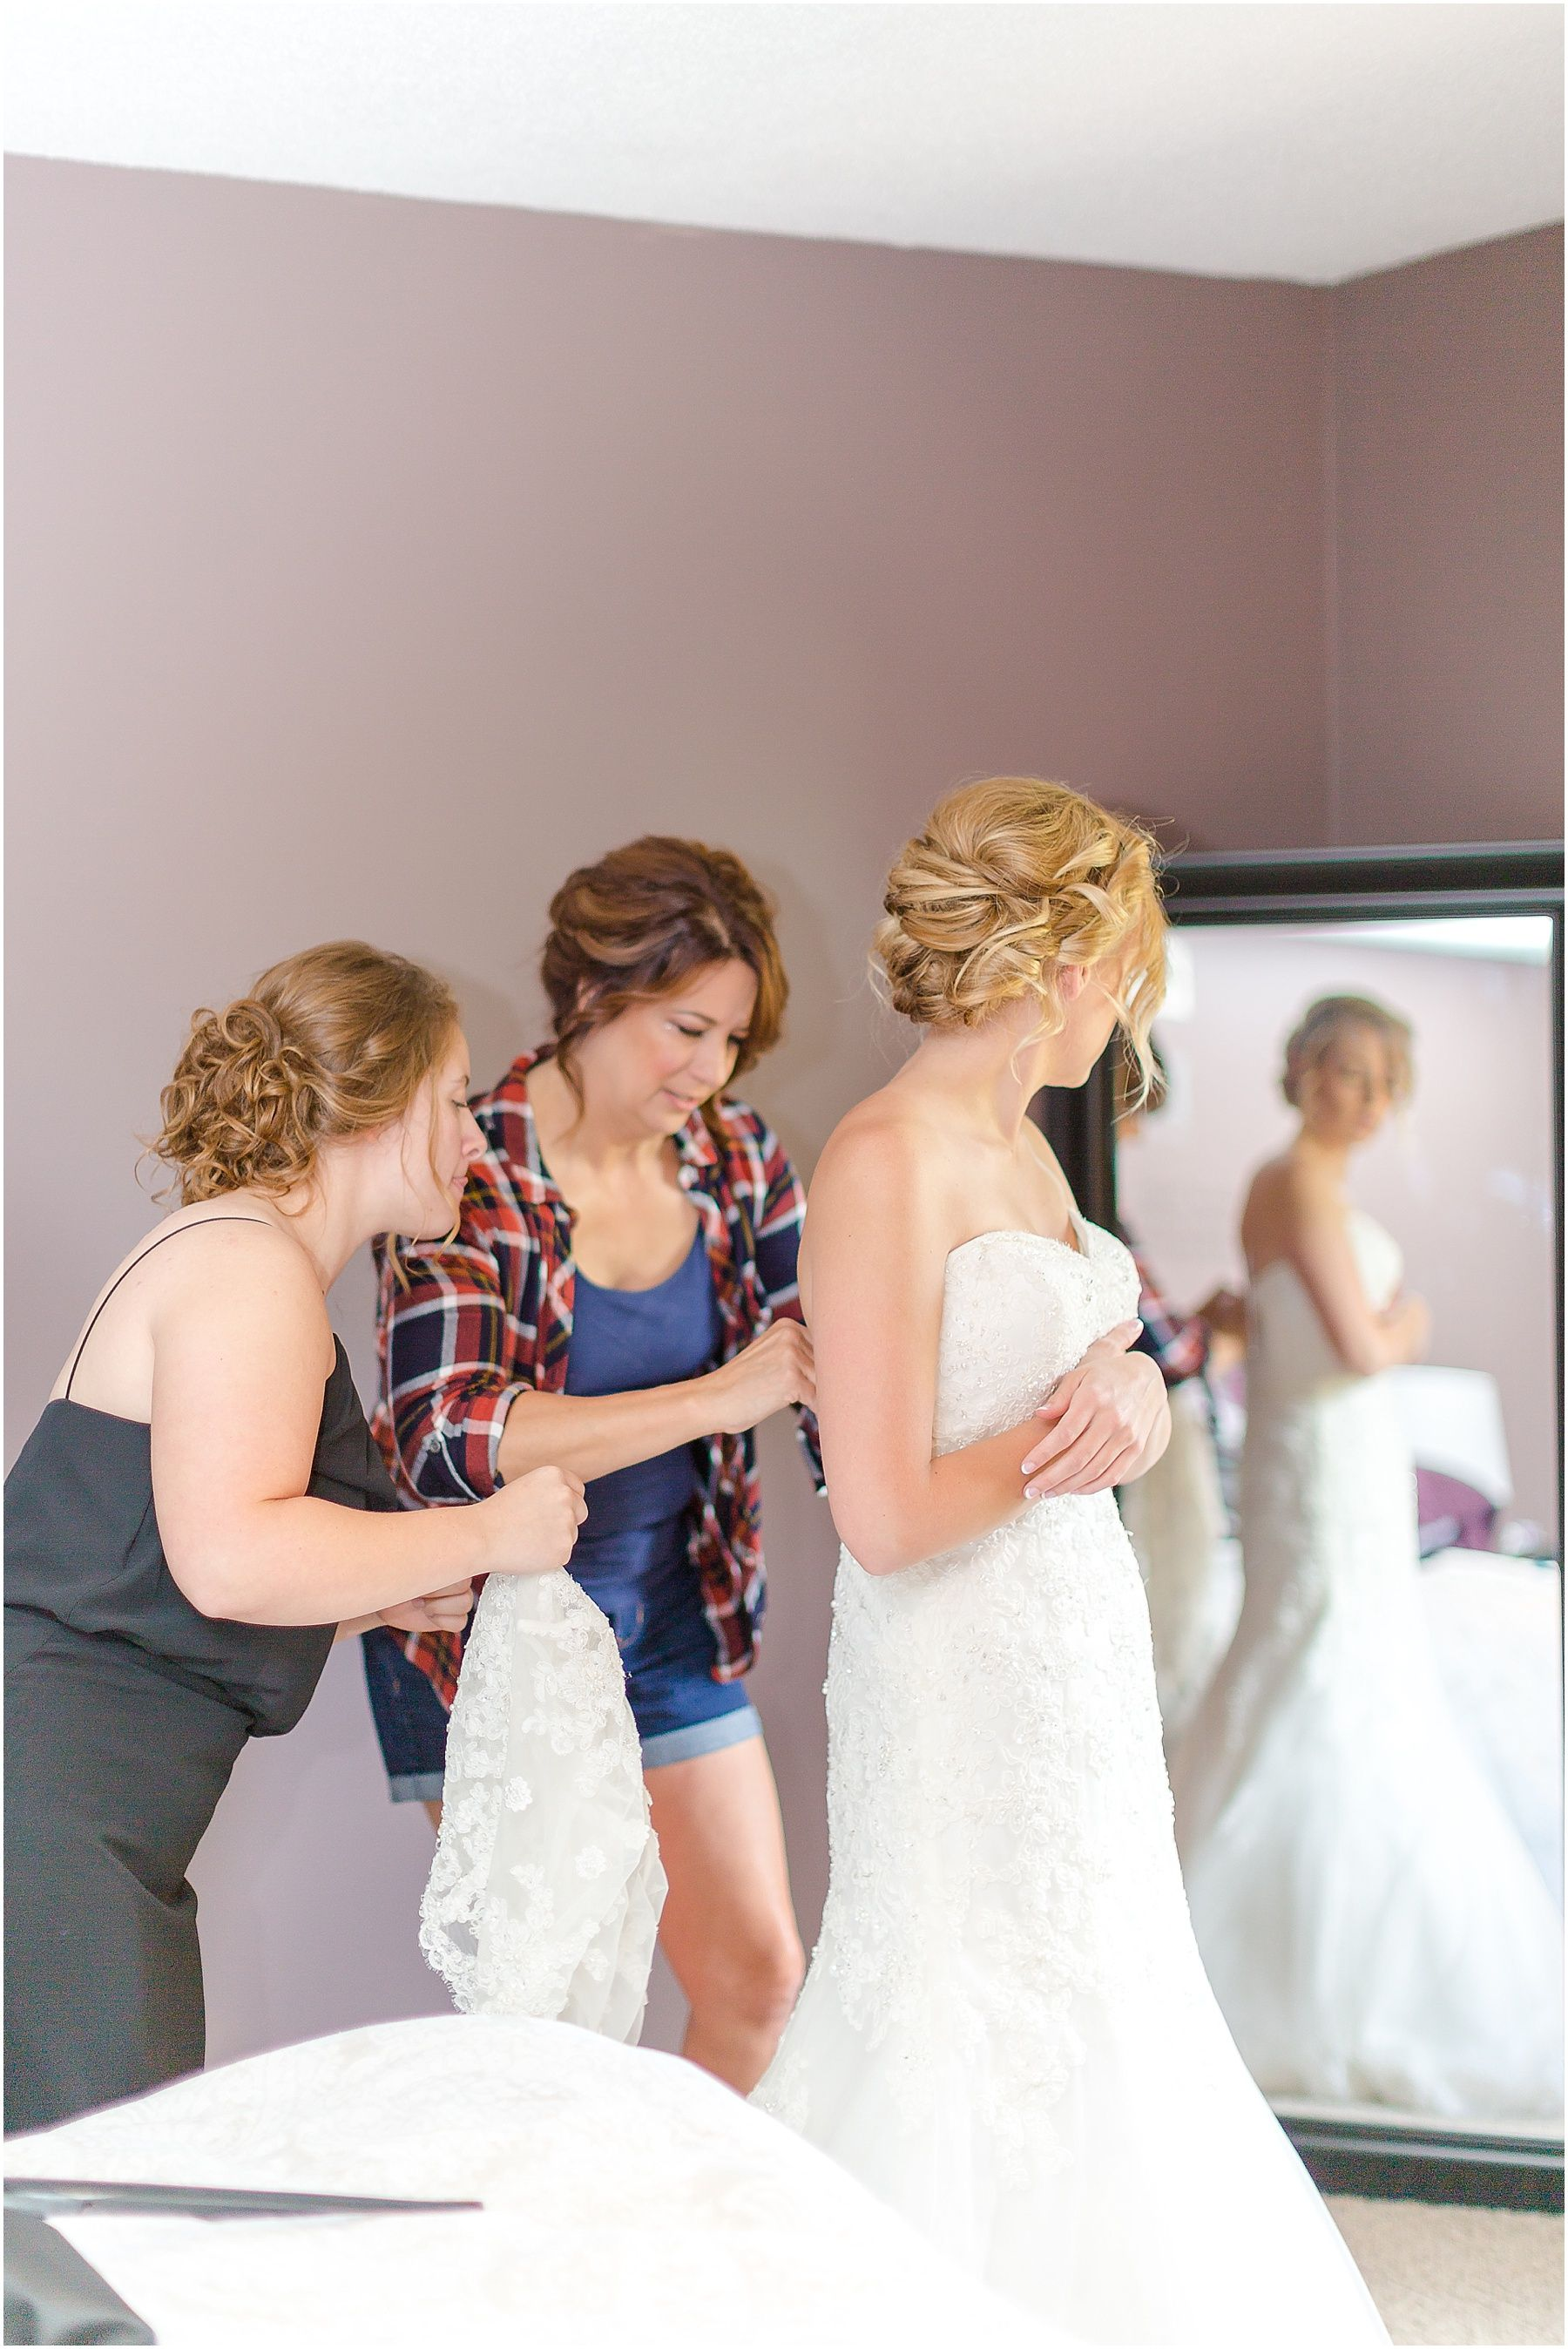 Maroon and white wedding decor  Pin by Gina Sinn on Gina Sinn Photography  Pinterest